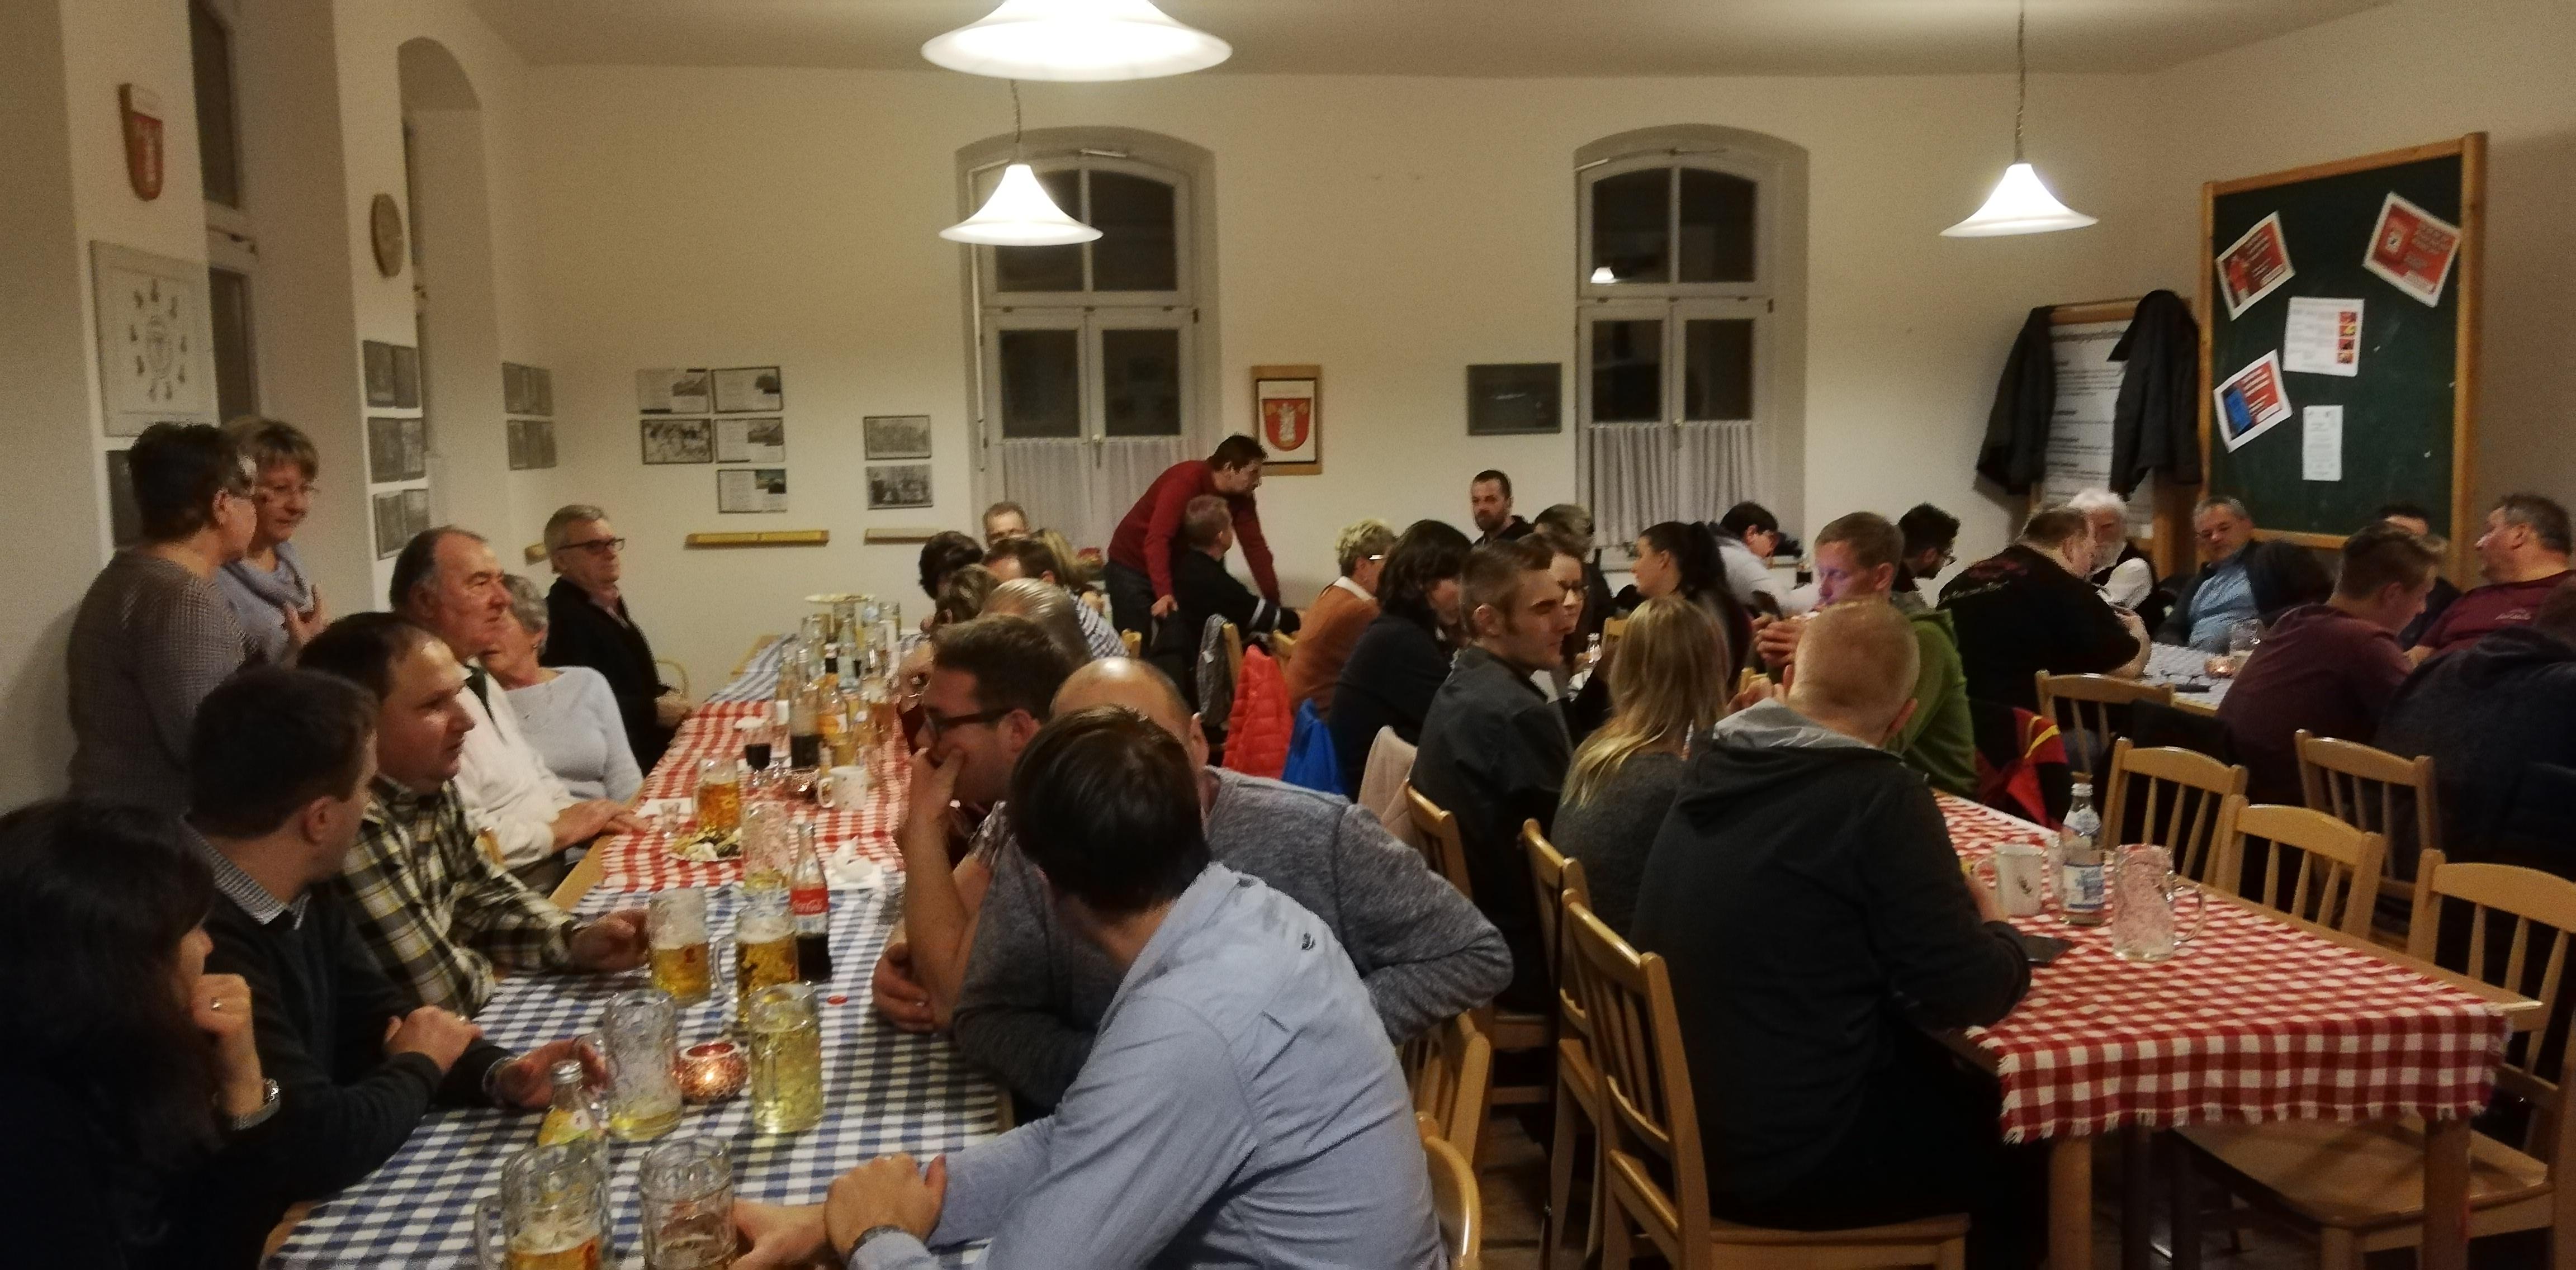 Jahresabschlussfeier 2018 - Kreuzberger Raum